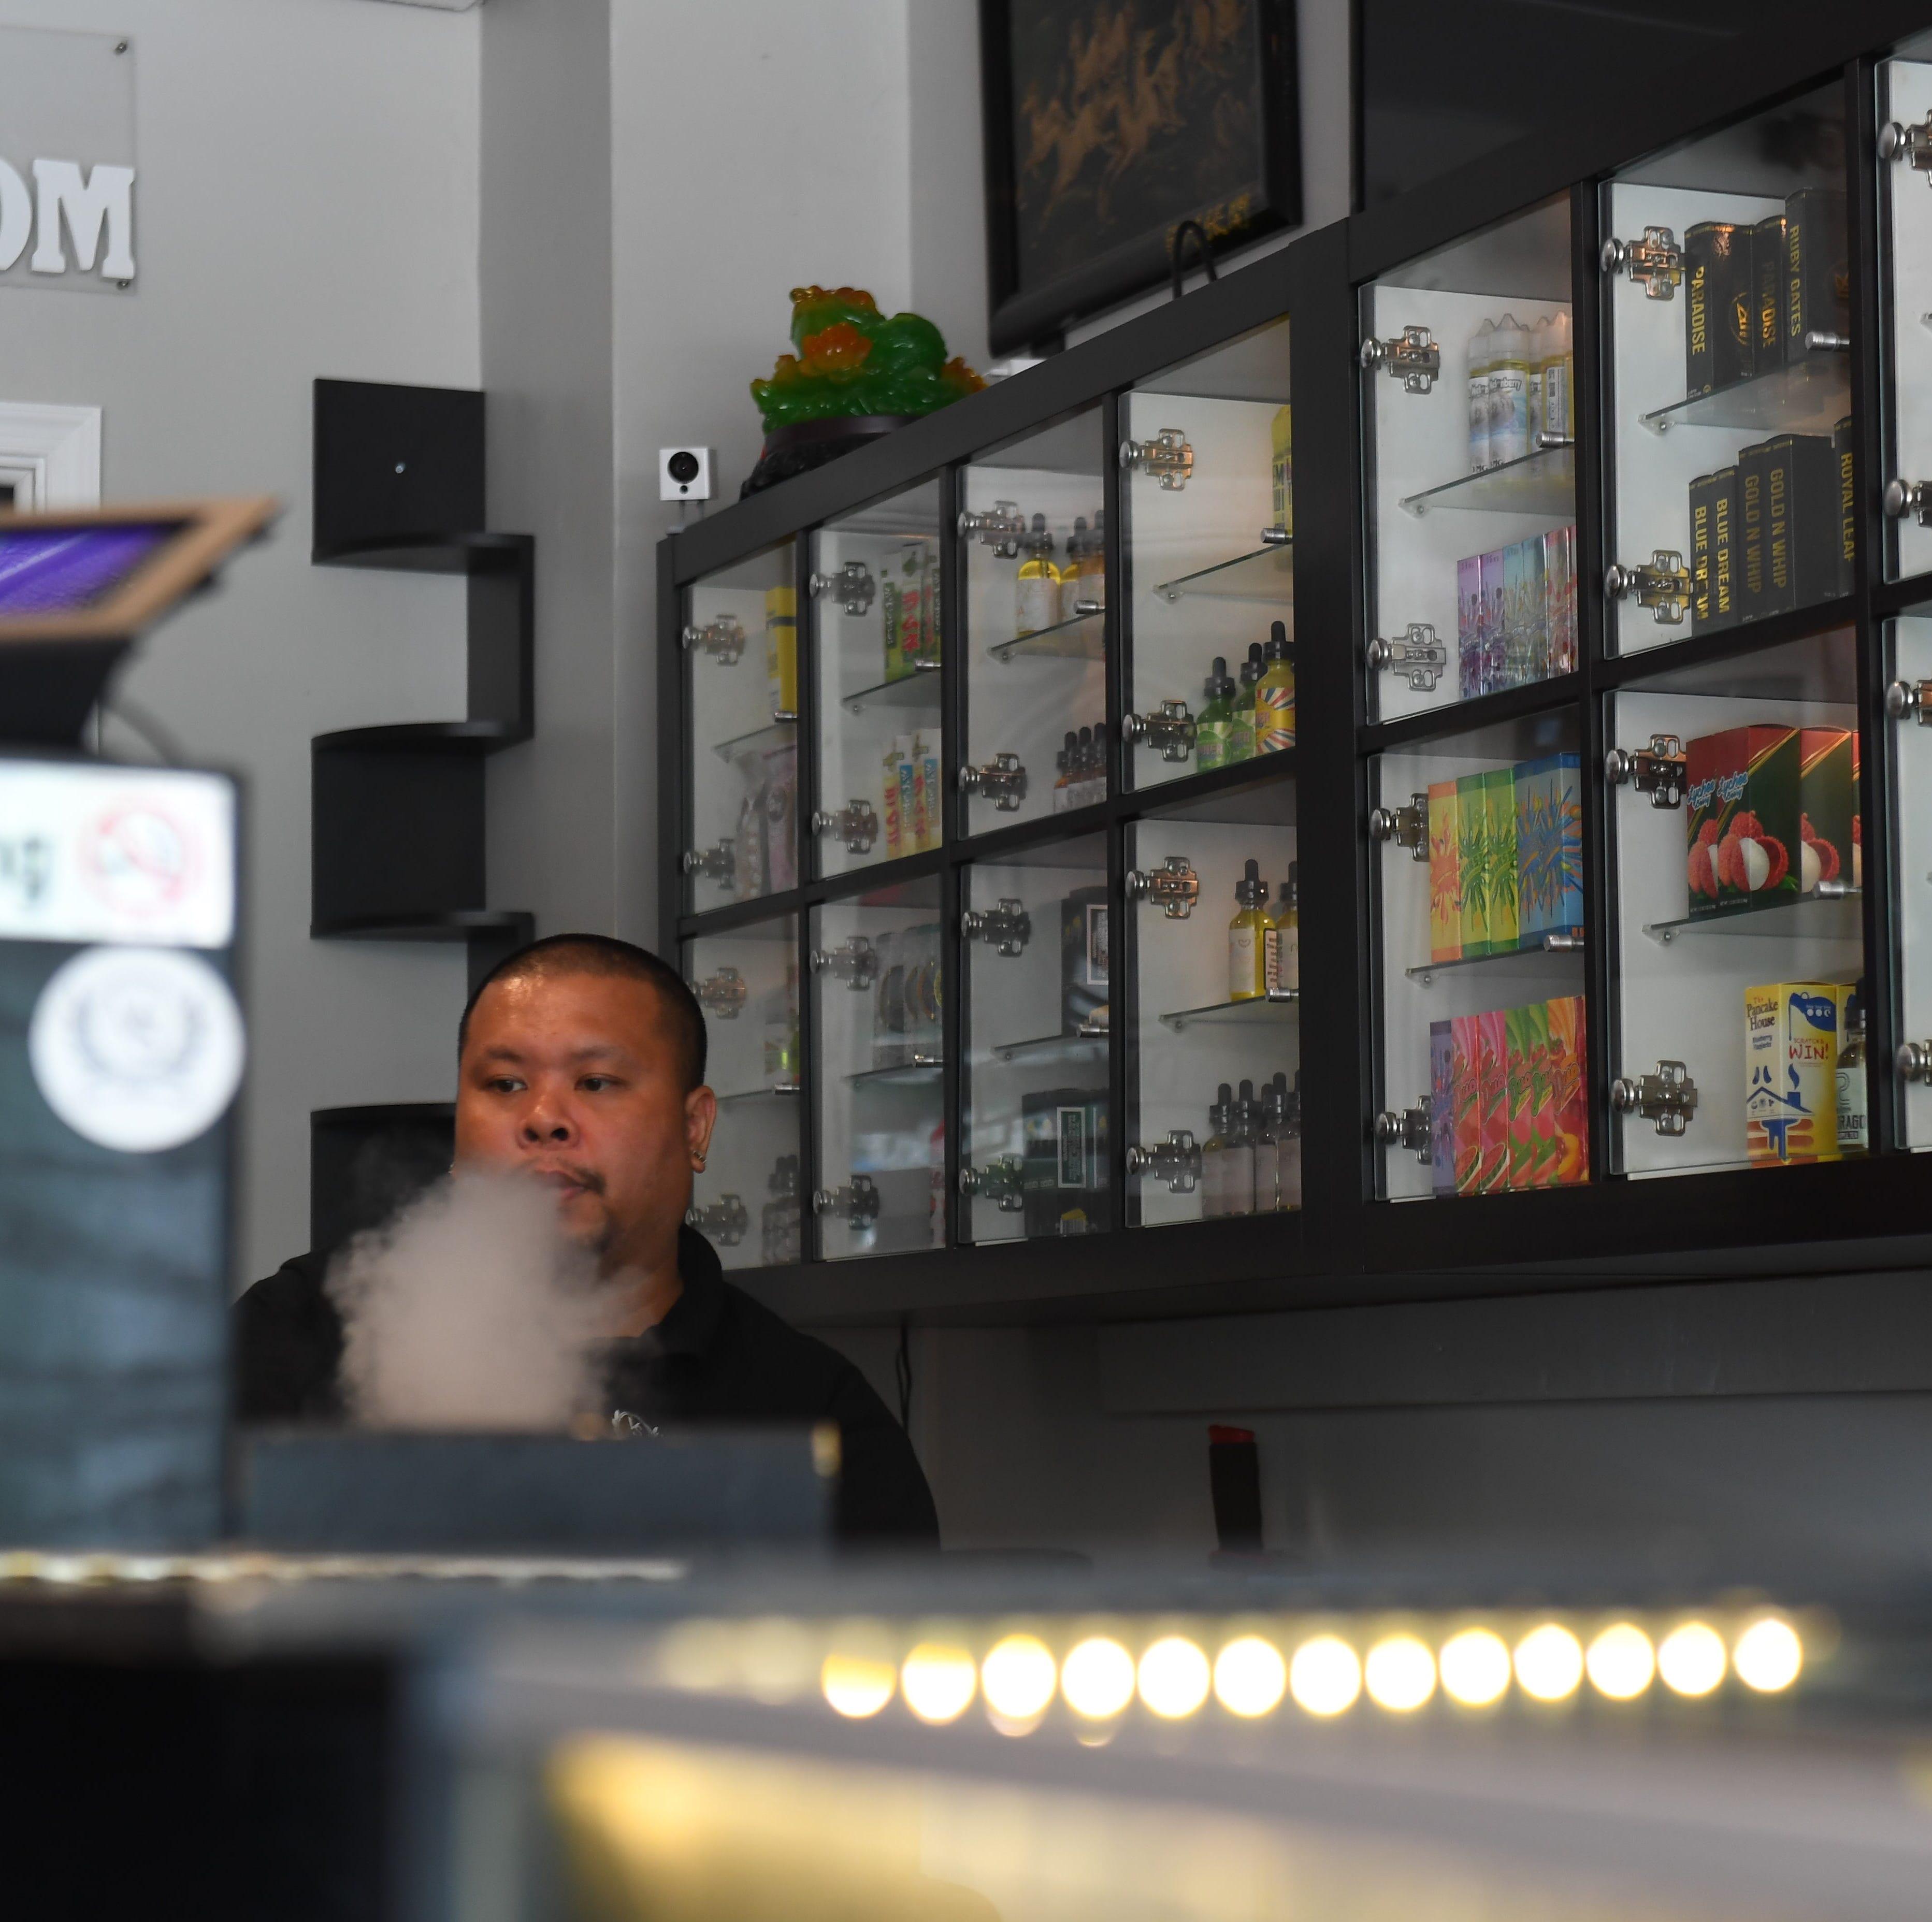 Brandon Nguyen, co founder of Vapor Solutions DMV, is seen vaping at the store in Falls Church, VA.